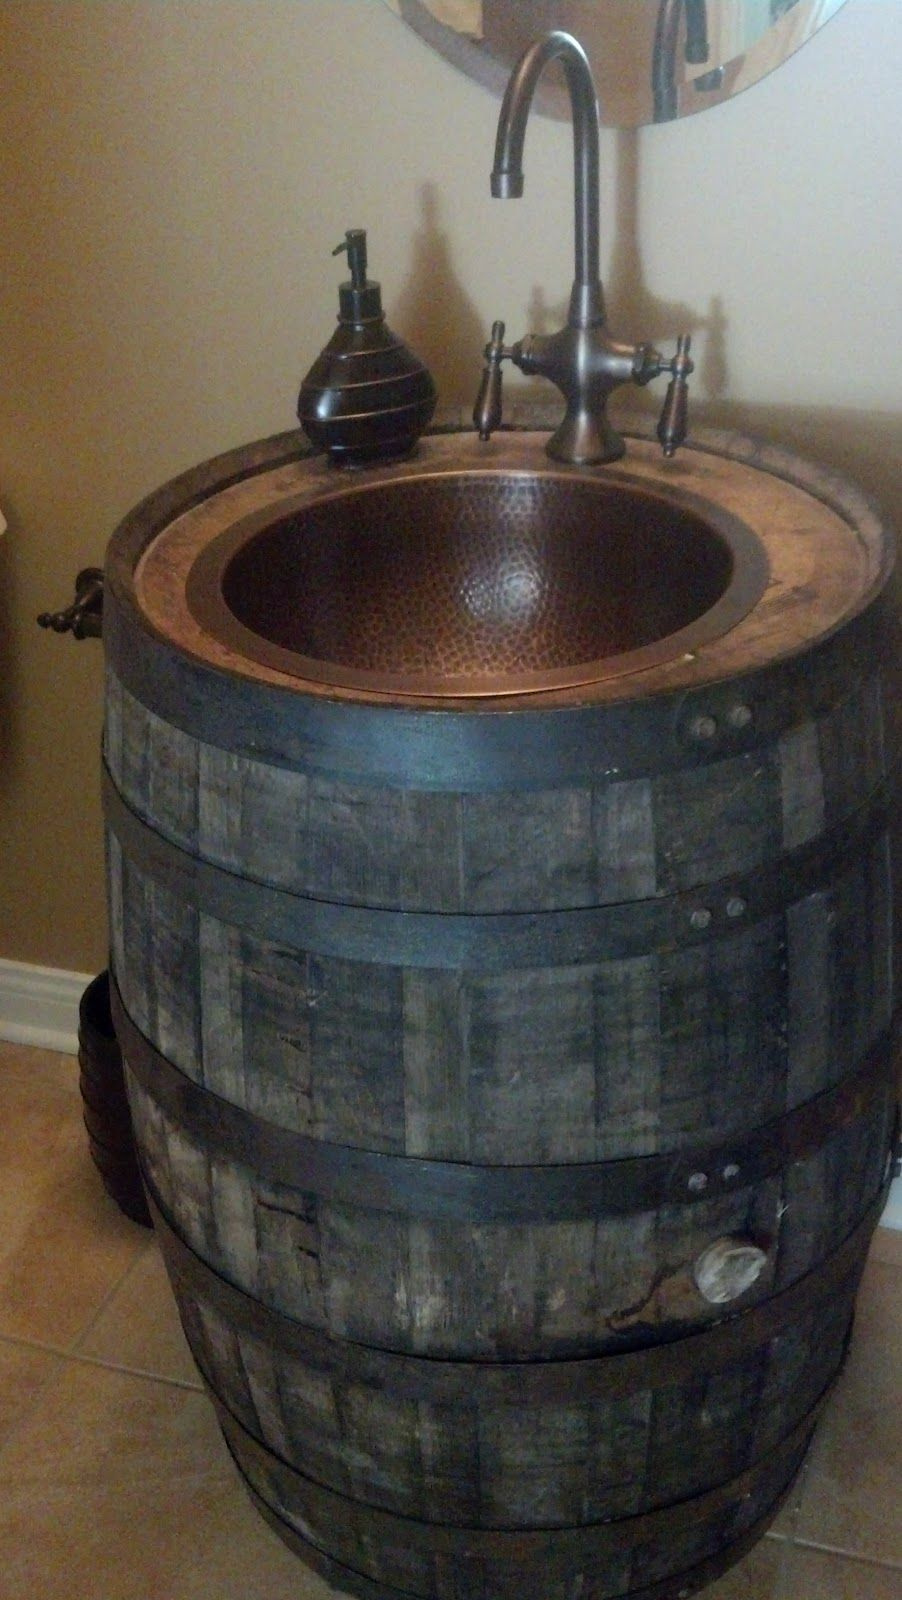 Bathroom Sinks Louisville Ky grey ridge designs at timberway farm: louisville, ky homearama